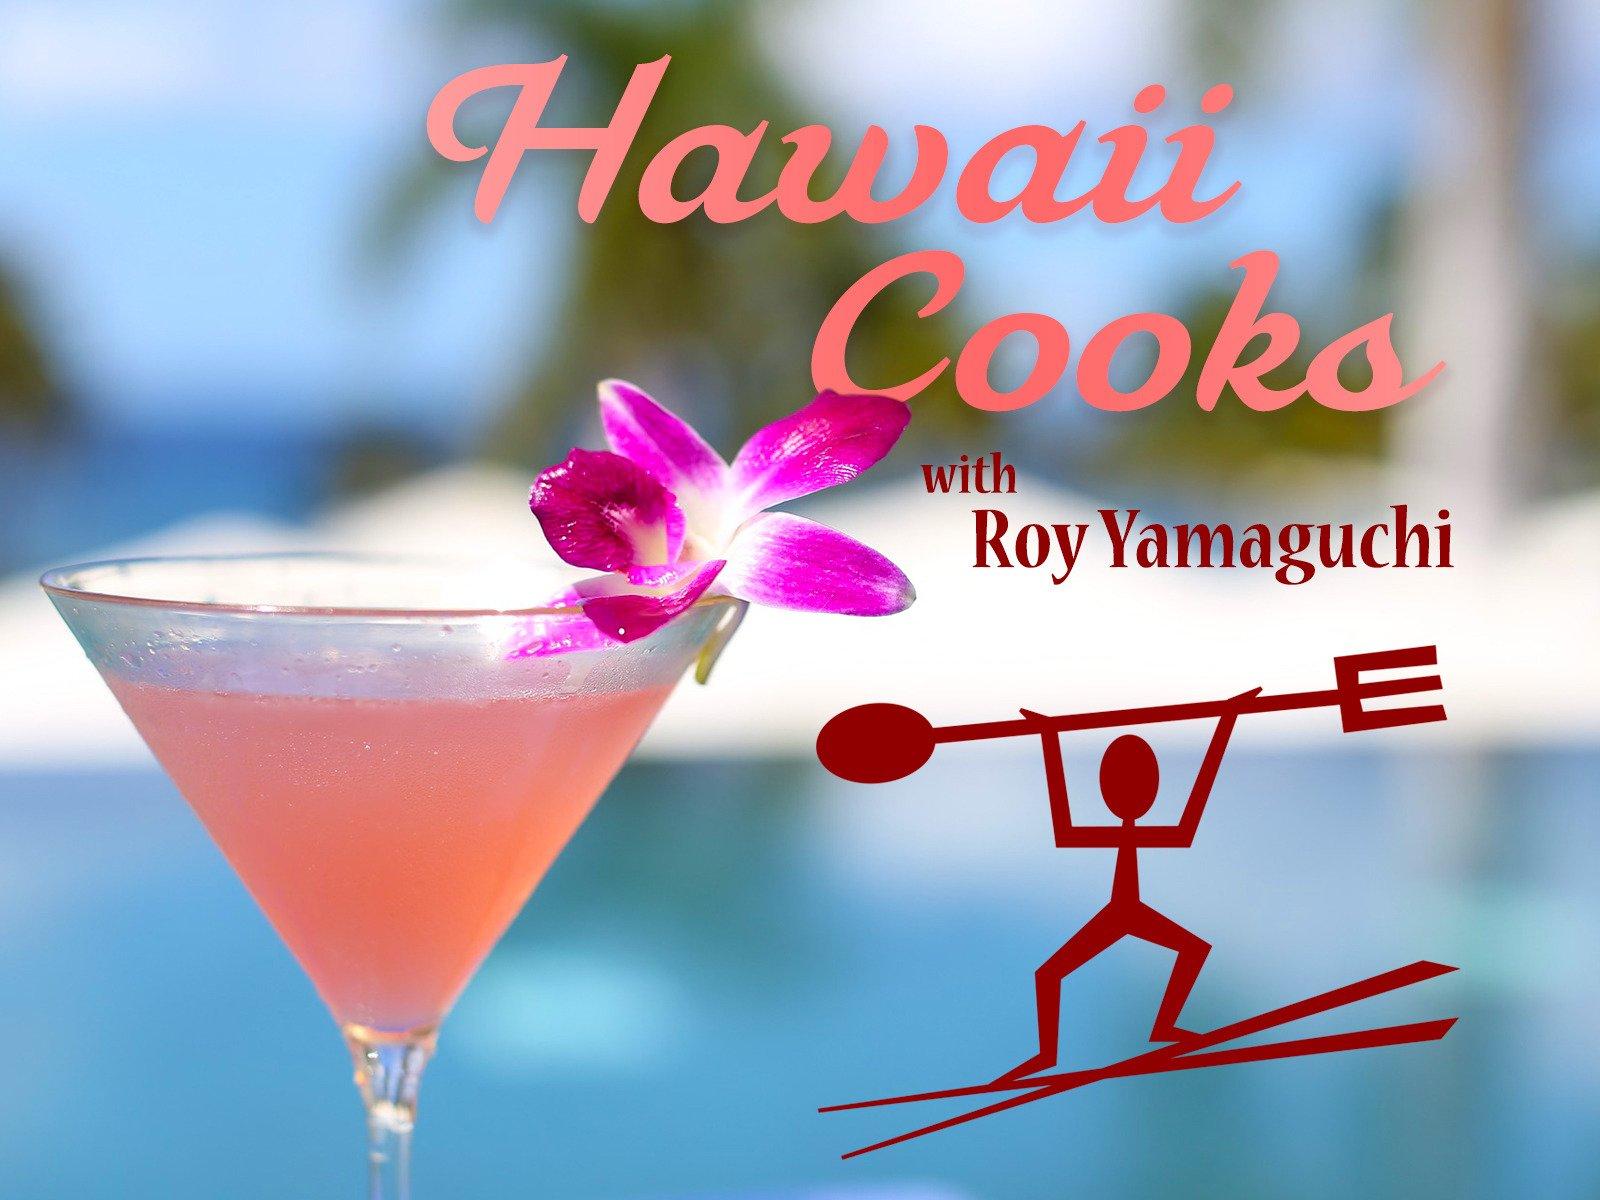 Hawaii Cooks with Roy Yamaguchi - Season 2